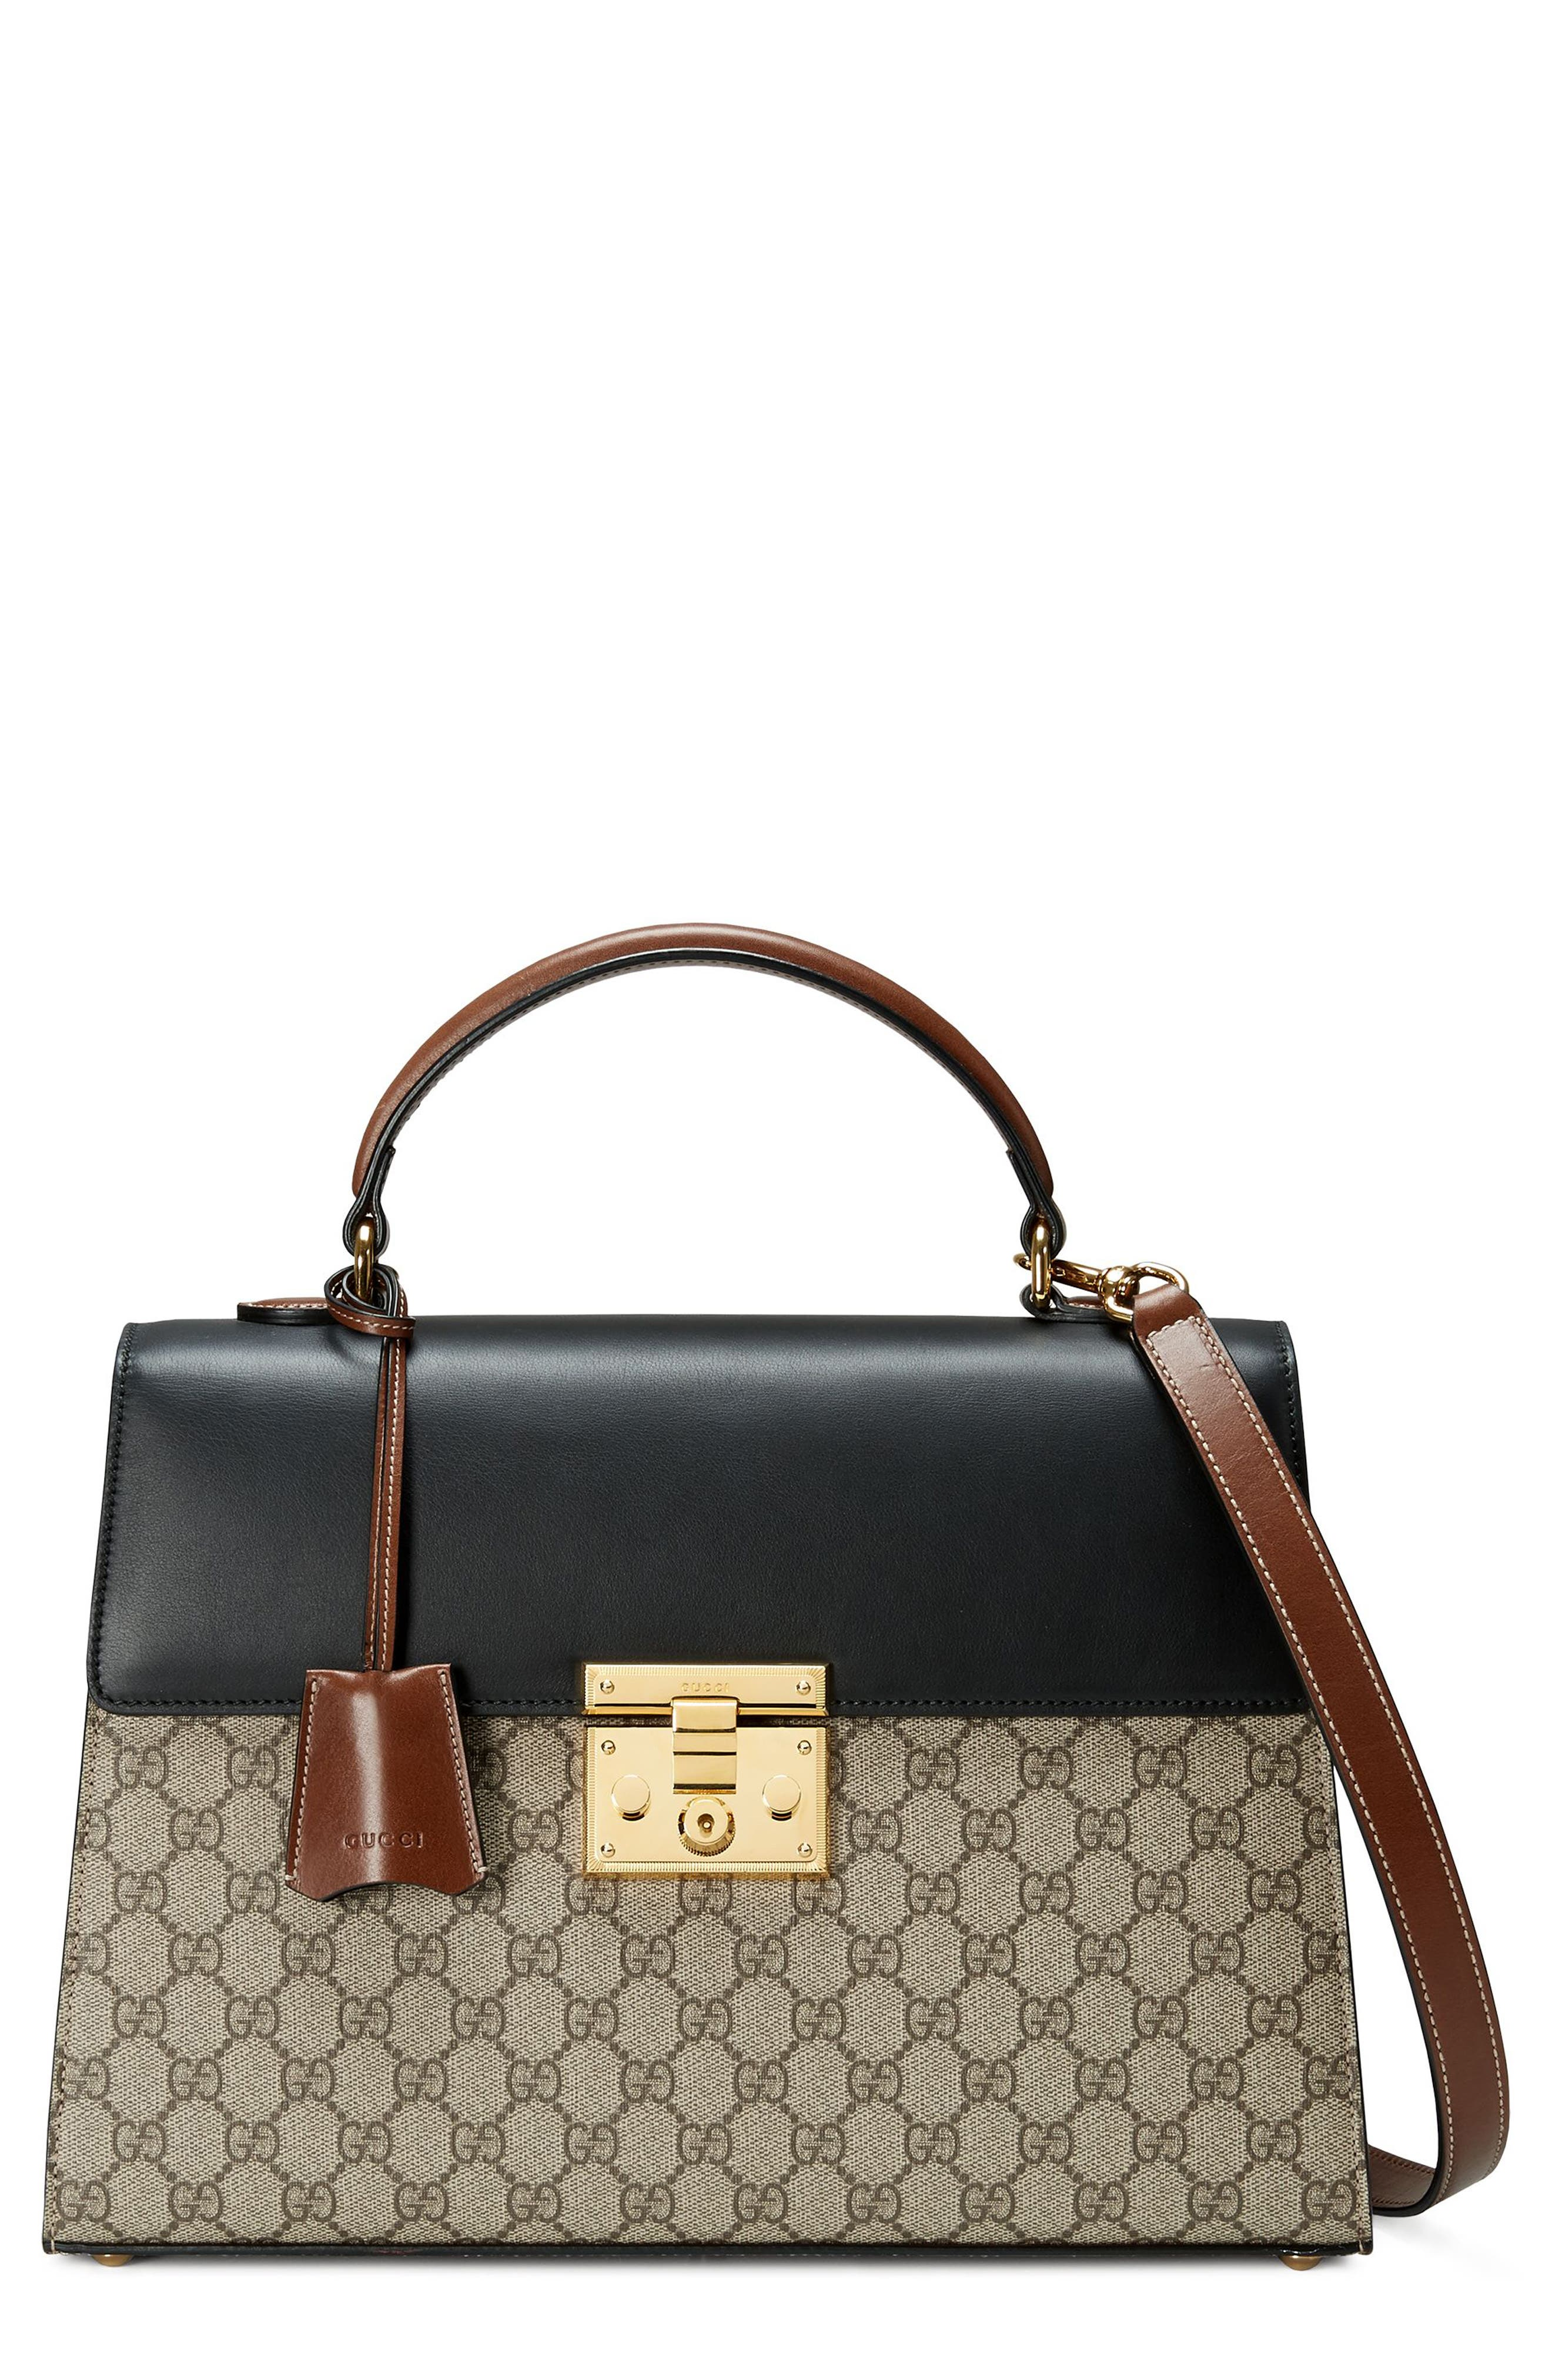 Medium Padlock Top Handle GG Supreme Canvas & Leather Bag,                         Main,                         color, 964